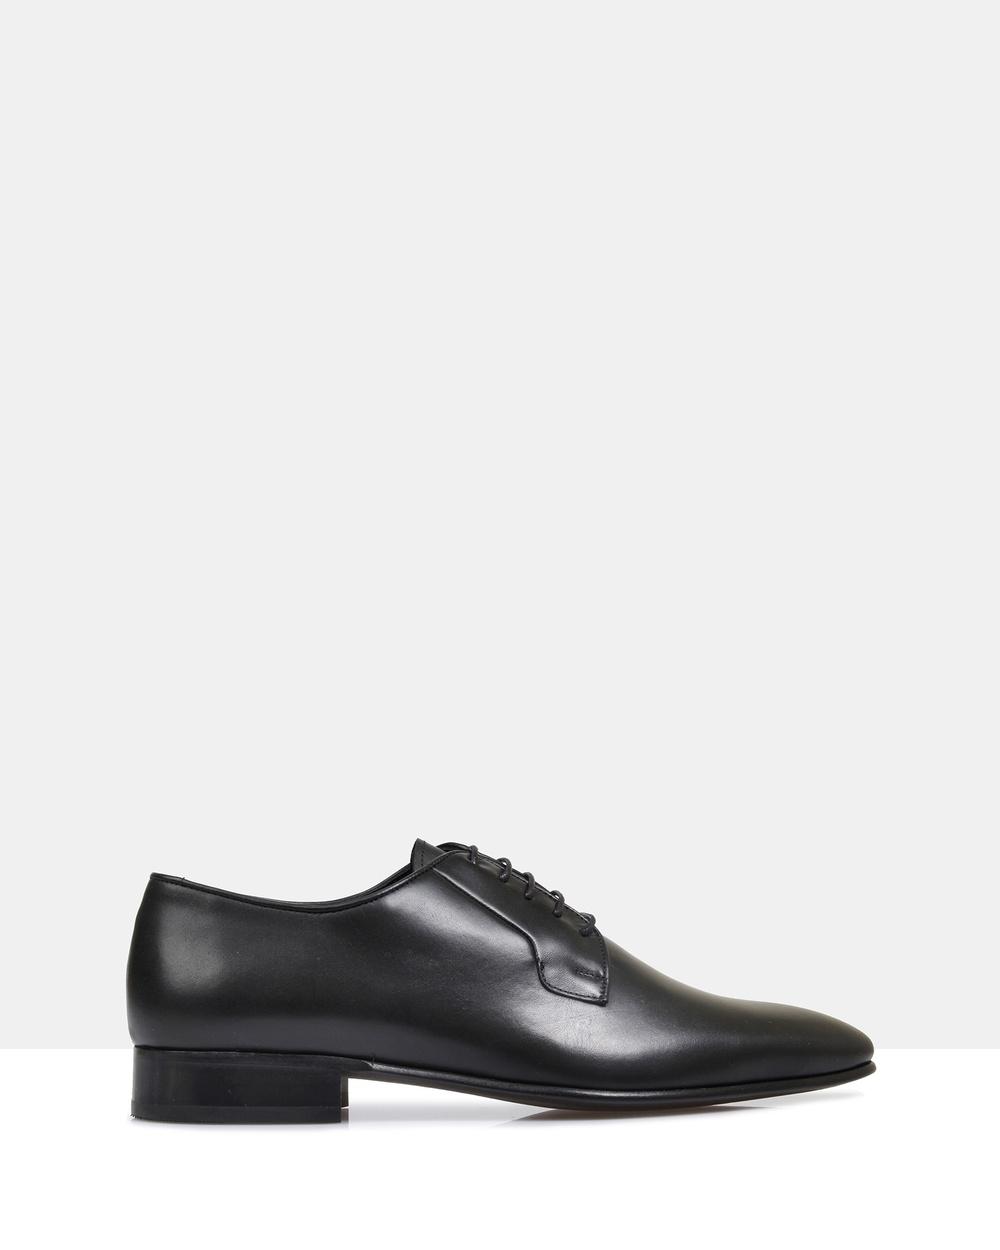 Brando Ellis Leather Derby Shoes Dress Black Australia